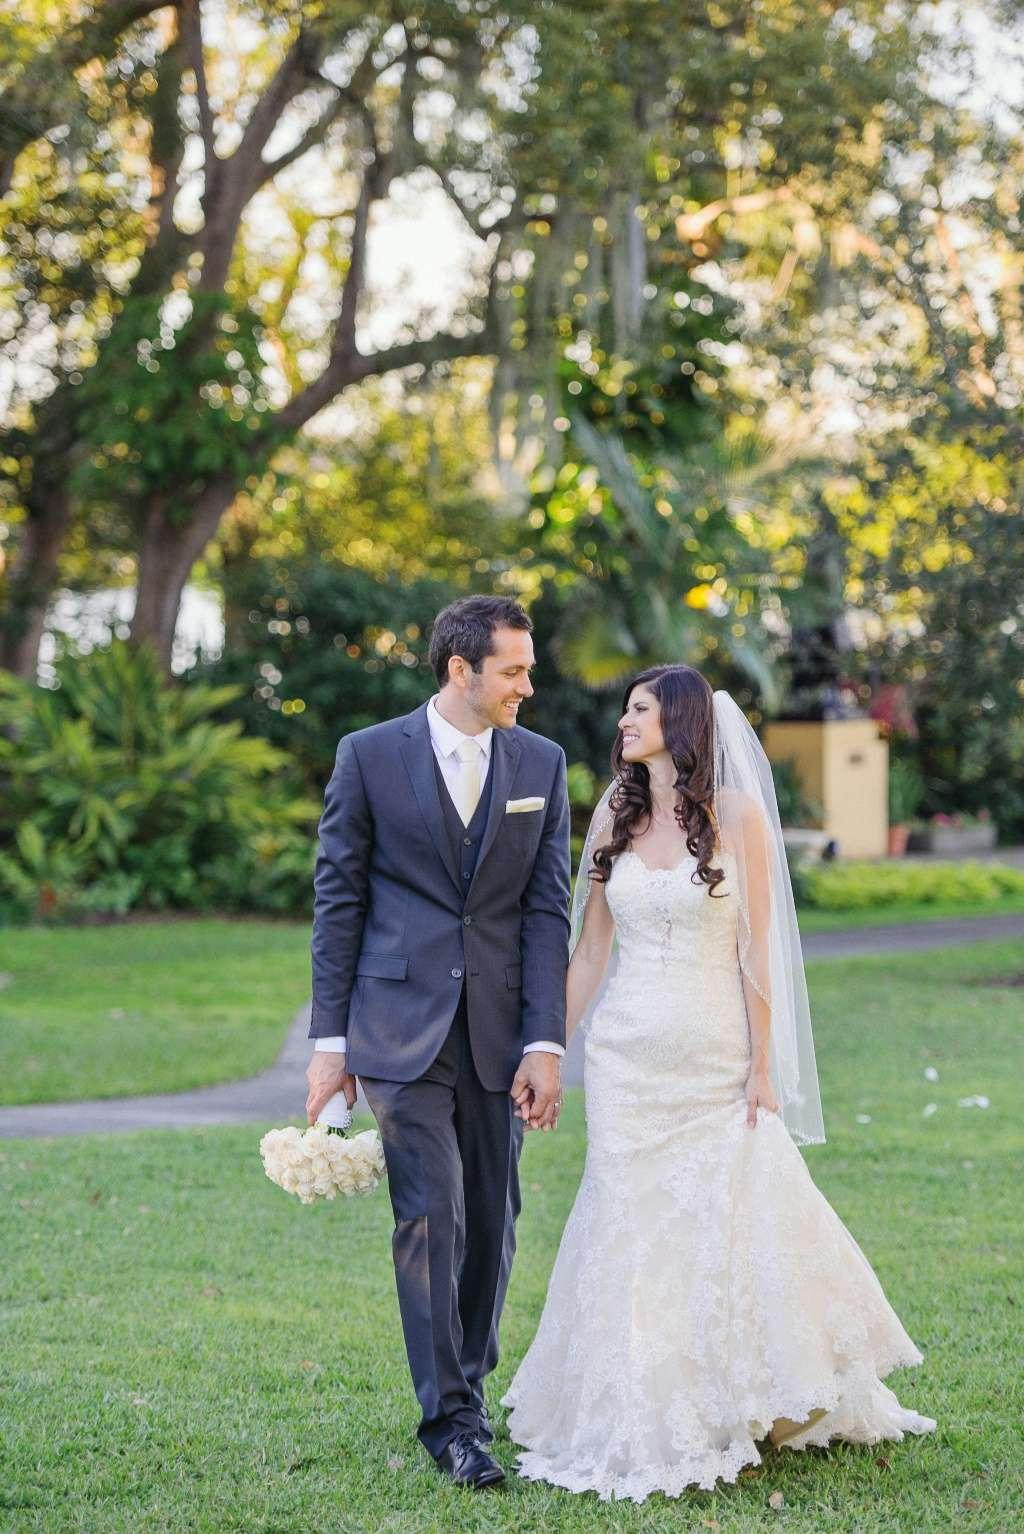 wedding offersen u0026 laroche albin polasek museum u0026 sculpture gardens